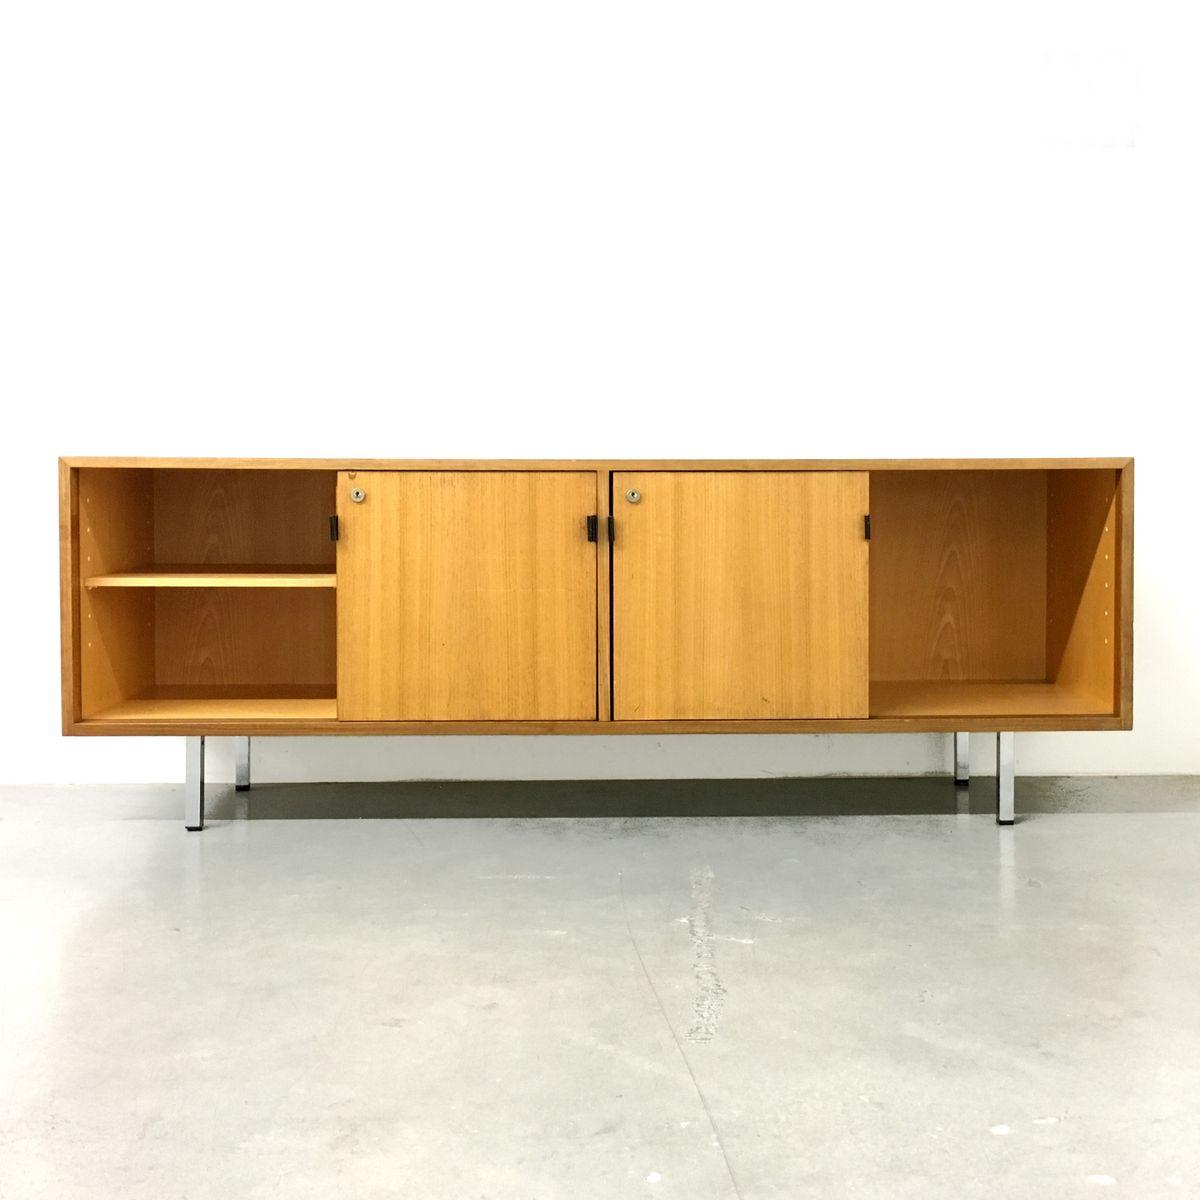 enfilade en noyer par florence knoll pour knoll international etats unis 1960s en vente sur pamono. Black Bedroom Furniture Sets. Home Design Ideas